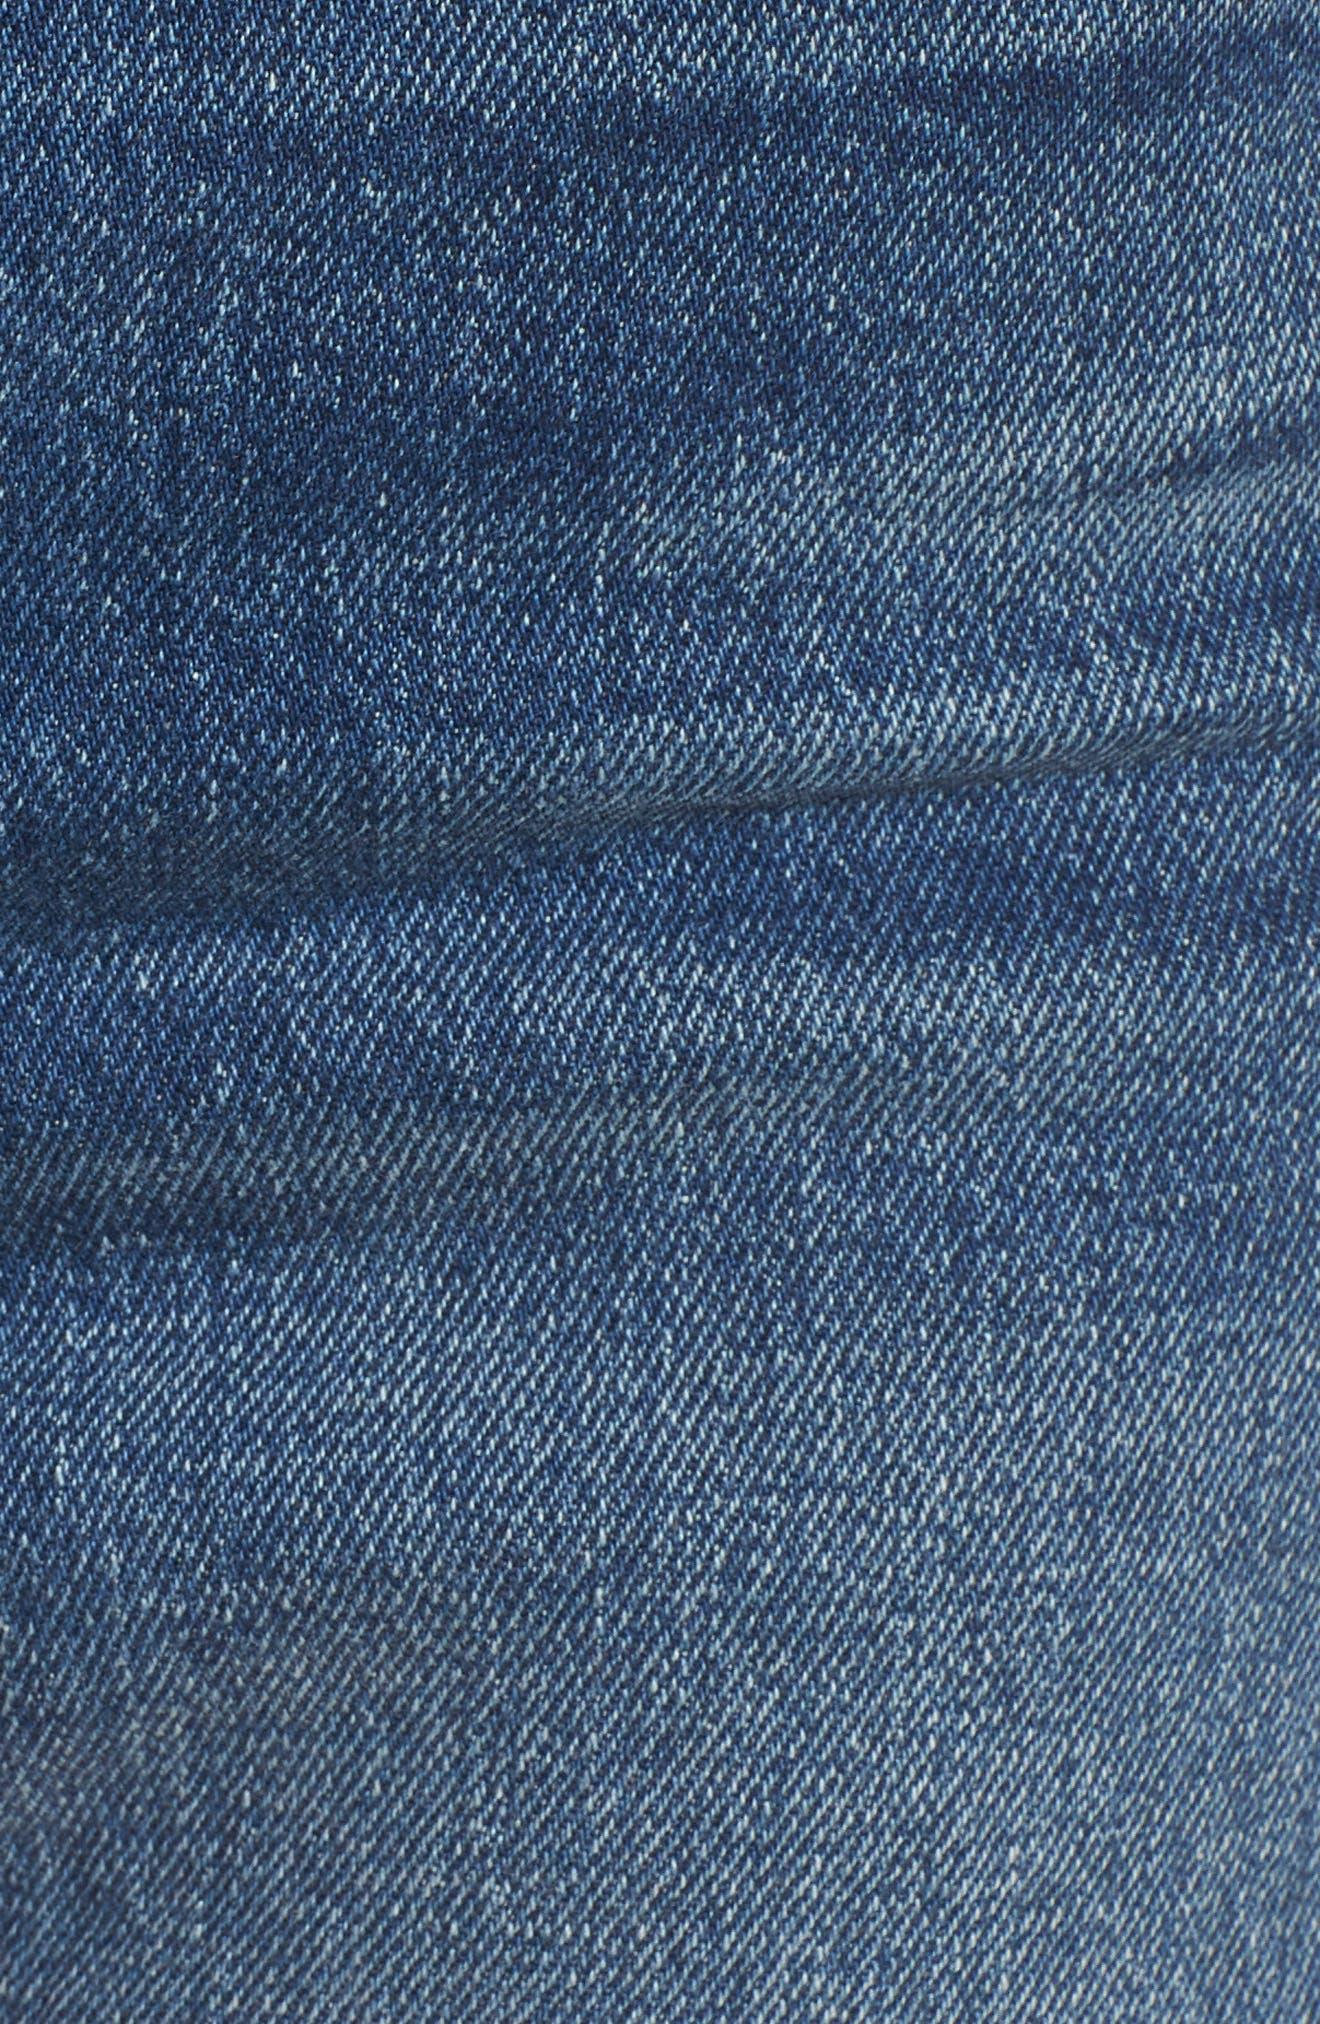 Wedgie Update Denim Shorts,                             Alternate thumbnail 6, color,                             401